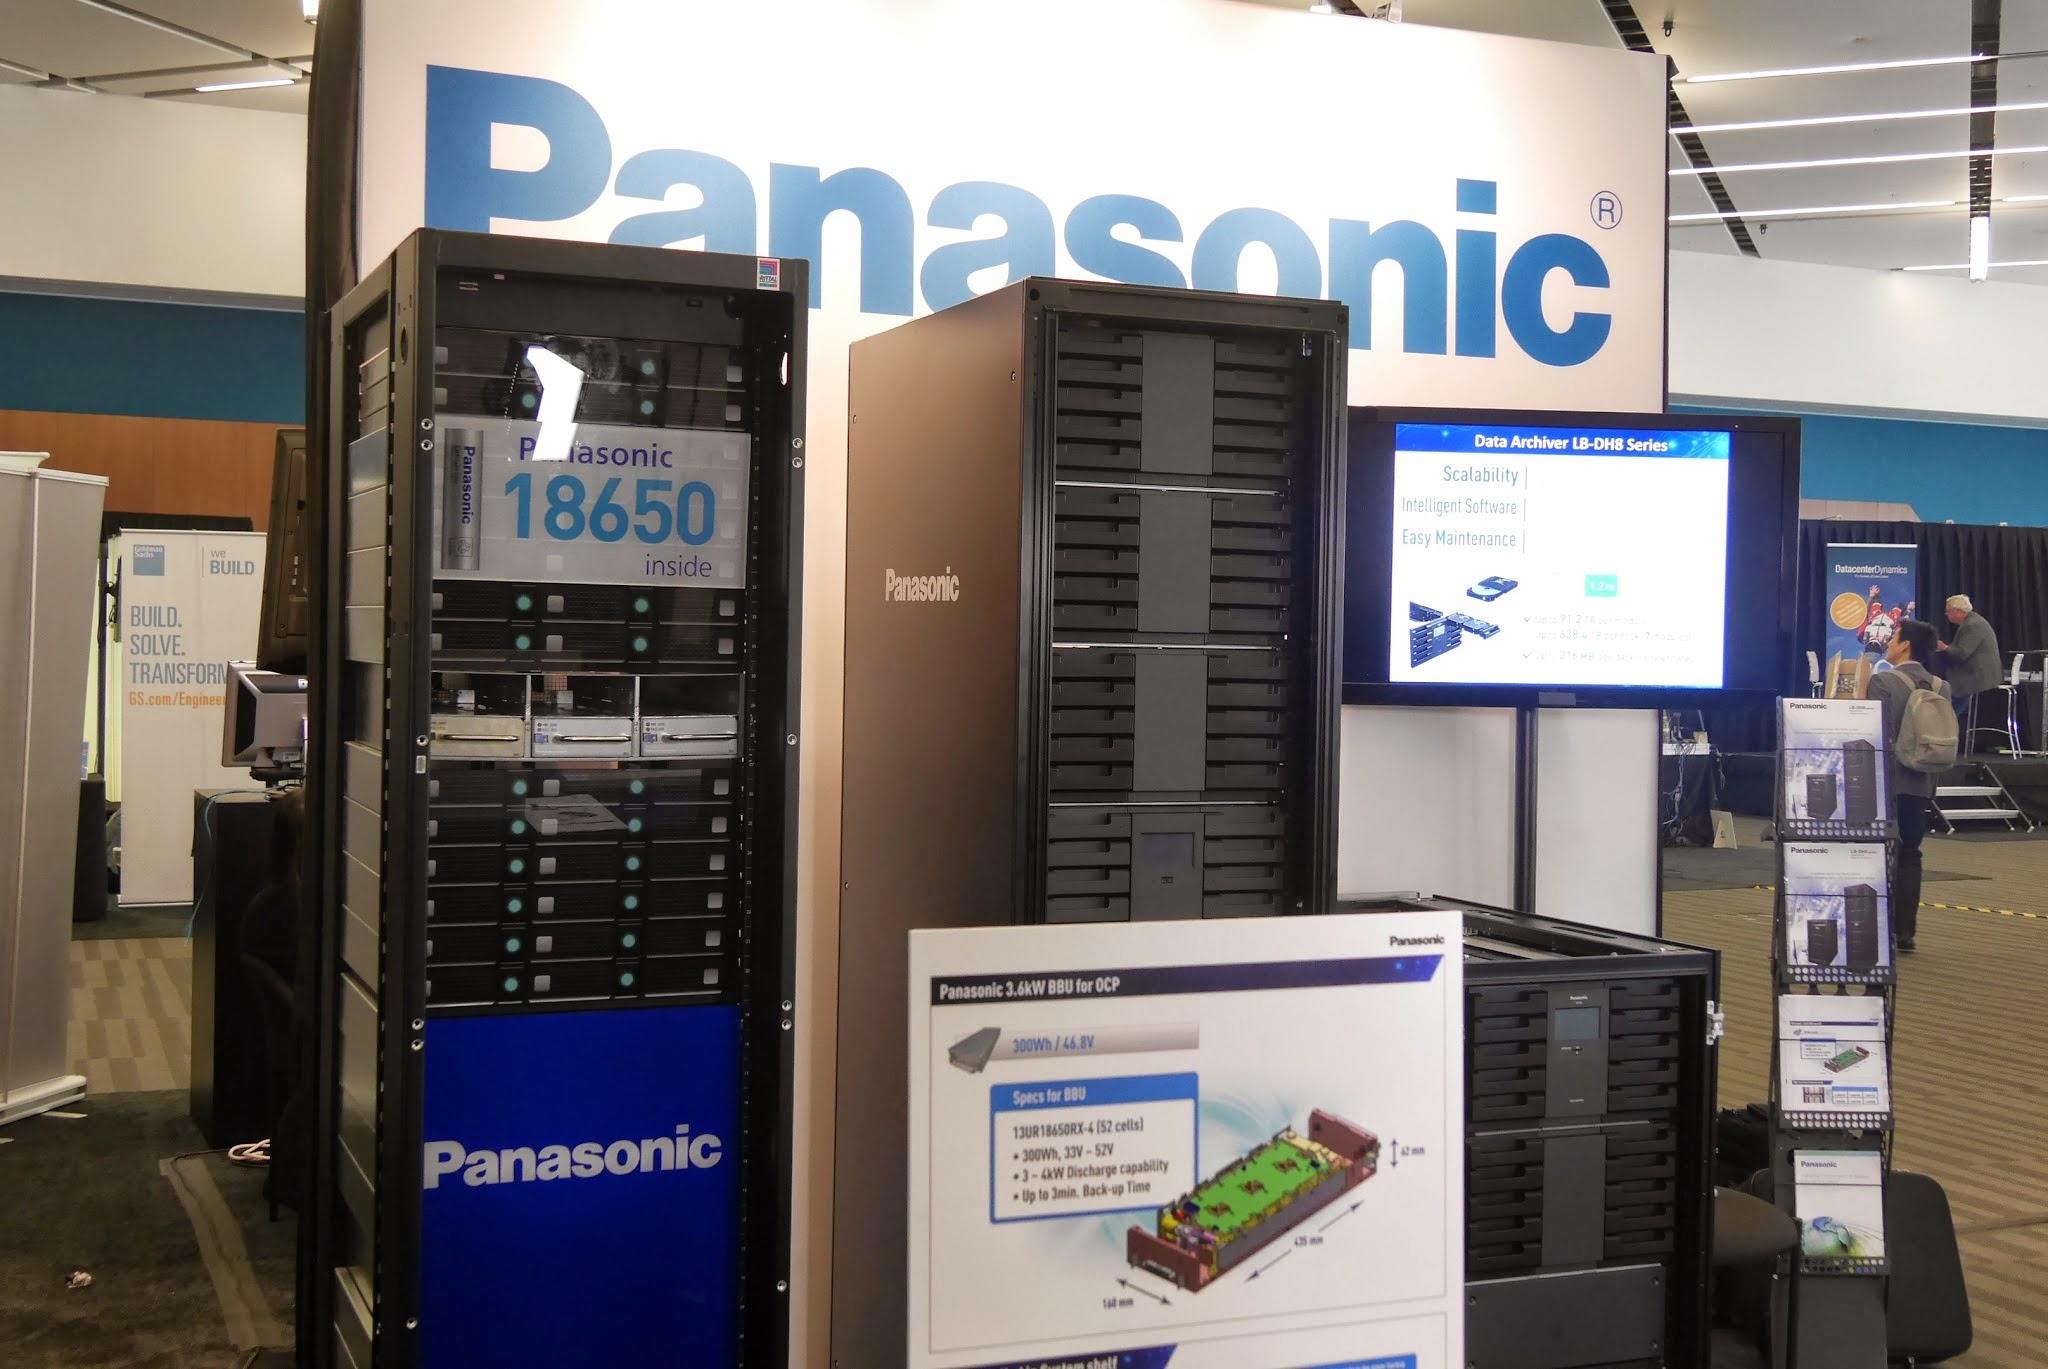 Panasonic Unveils Next Gen Data Storage and Battery Backup